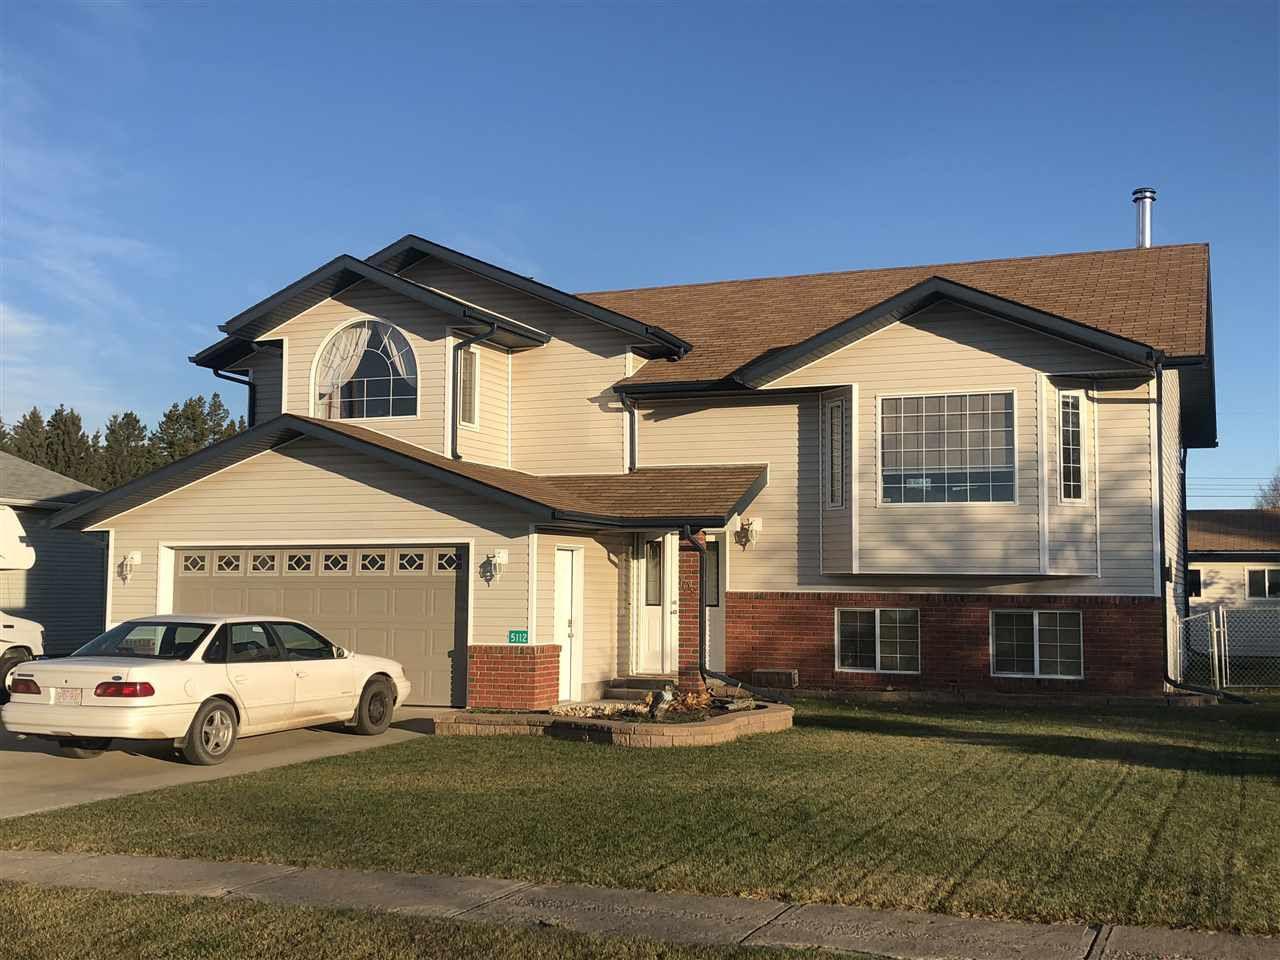 Main Photo: : Pickardville House for sale : MLS®# E4094273